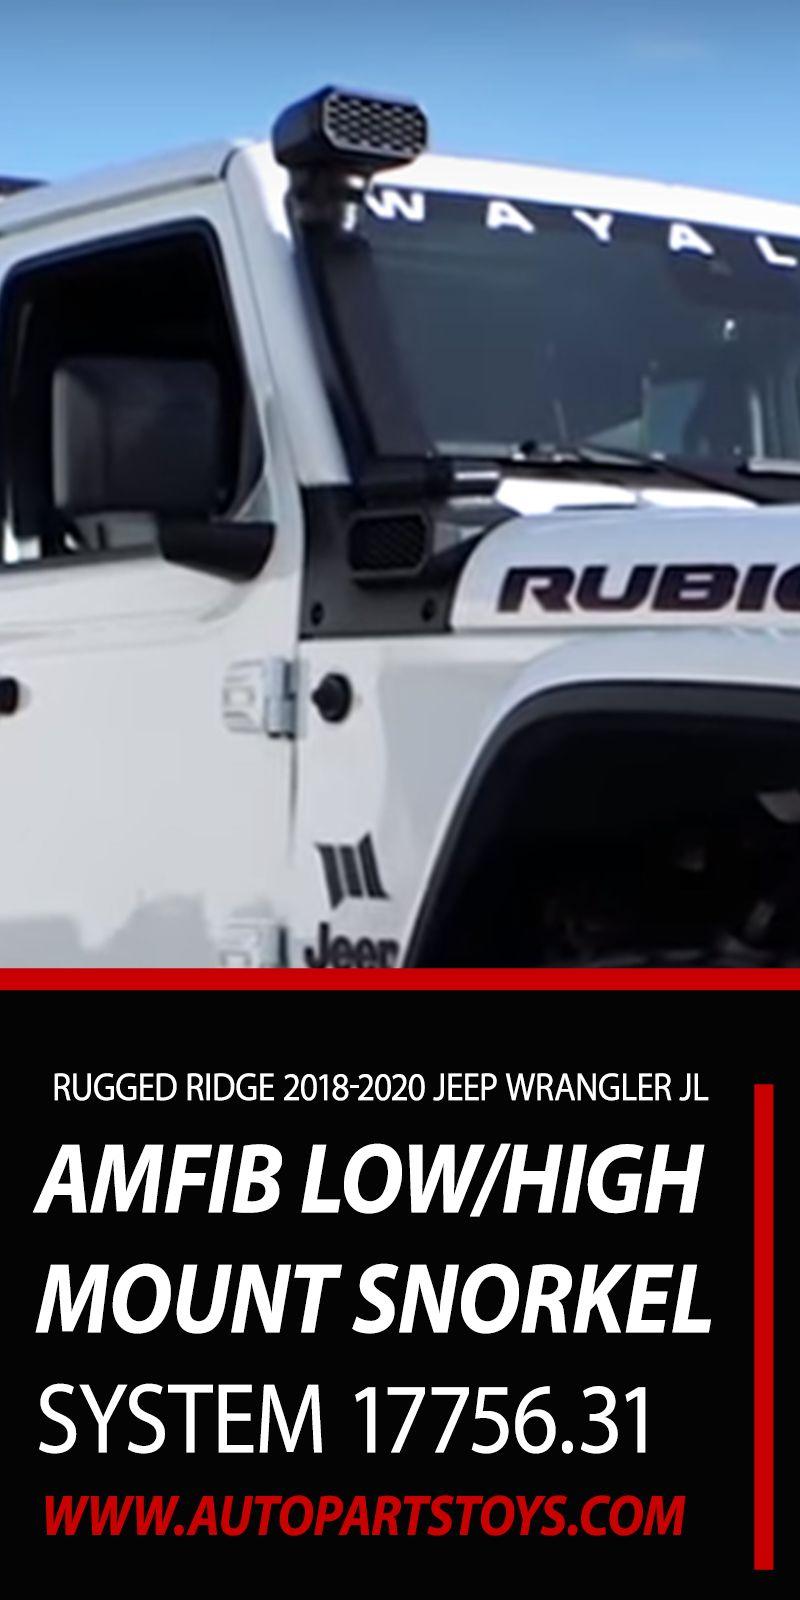 Rugged Ridge 20182020 Jeep Wrangler JL 20202021